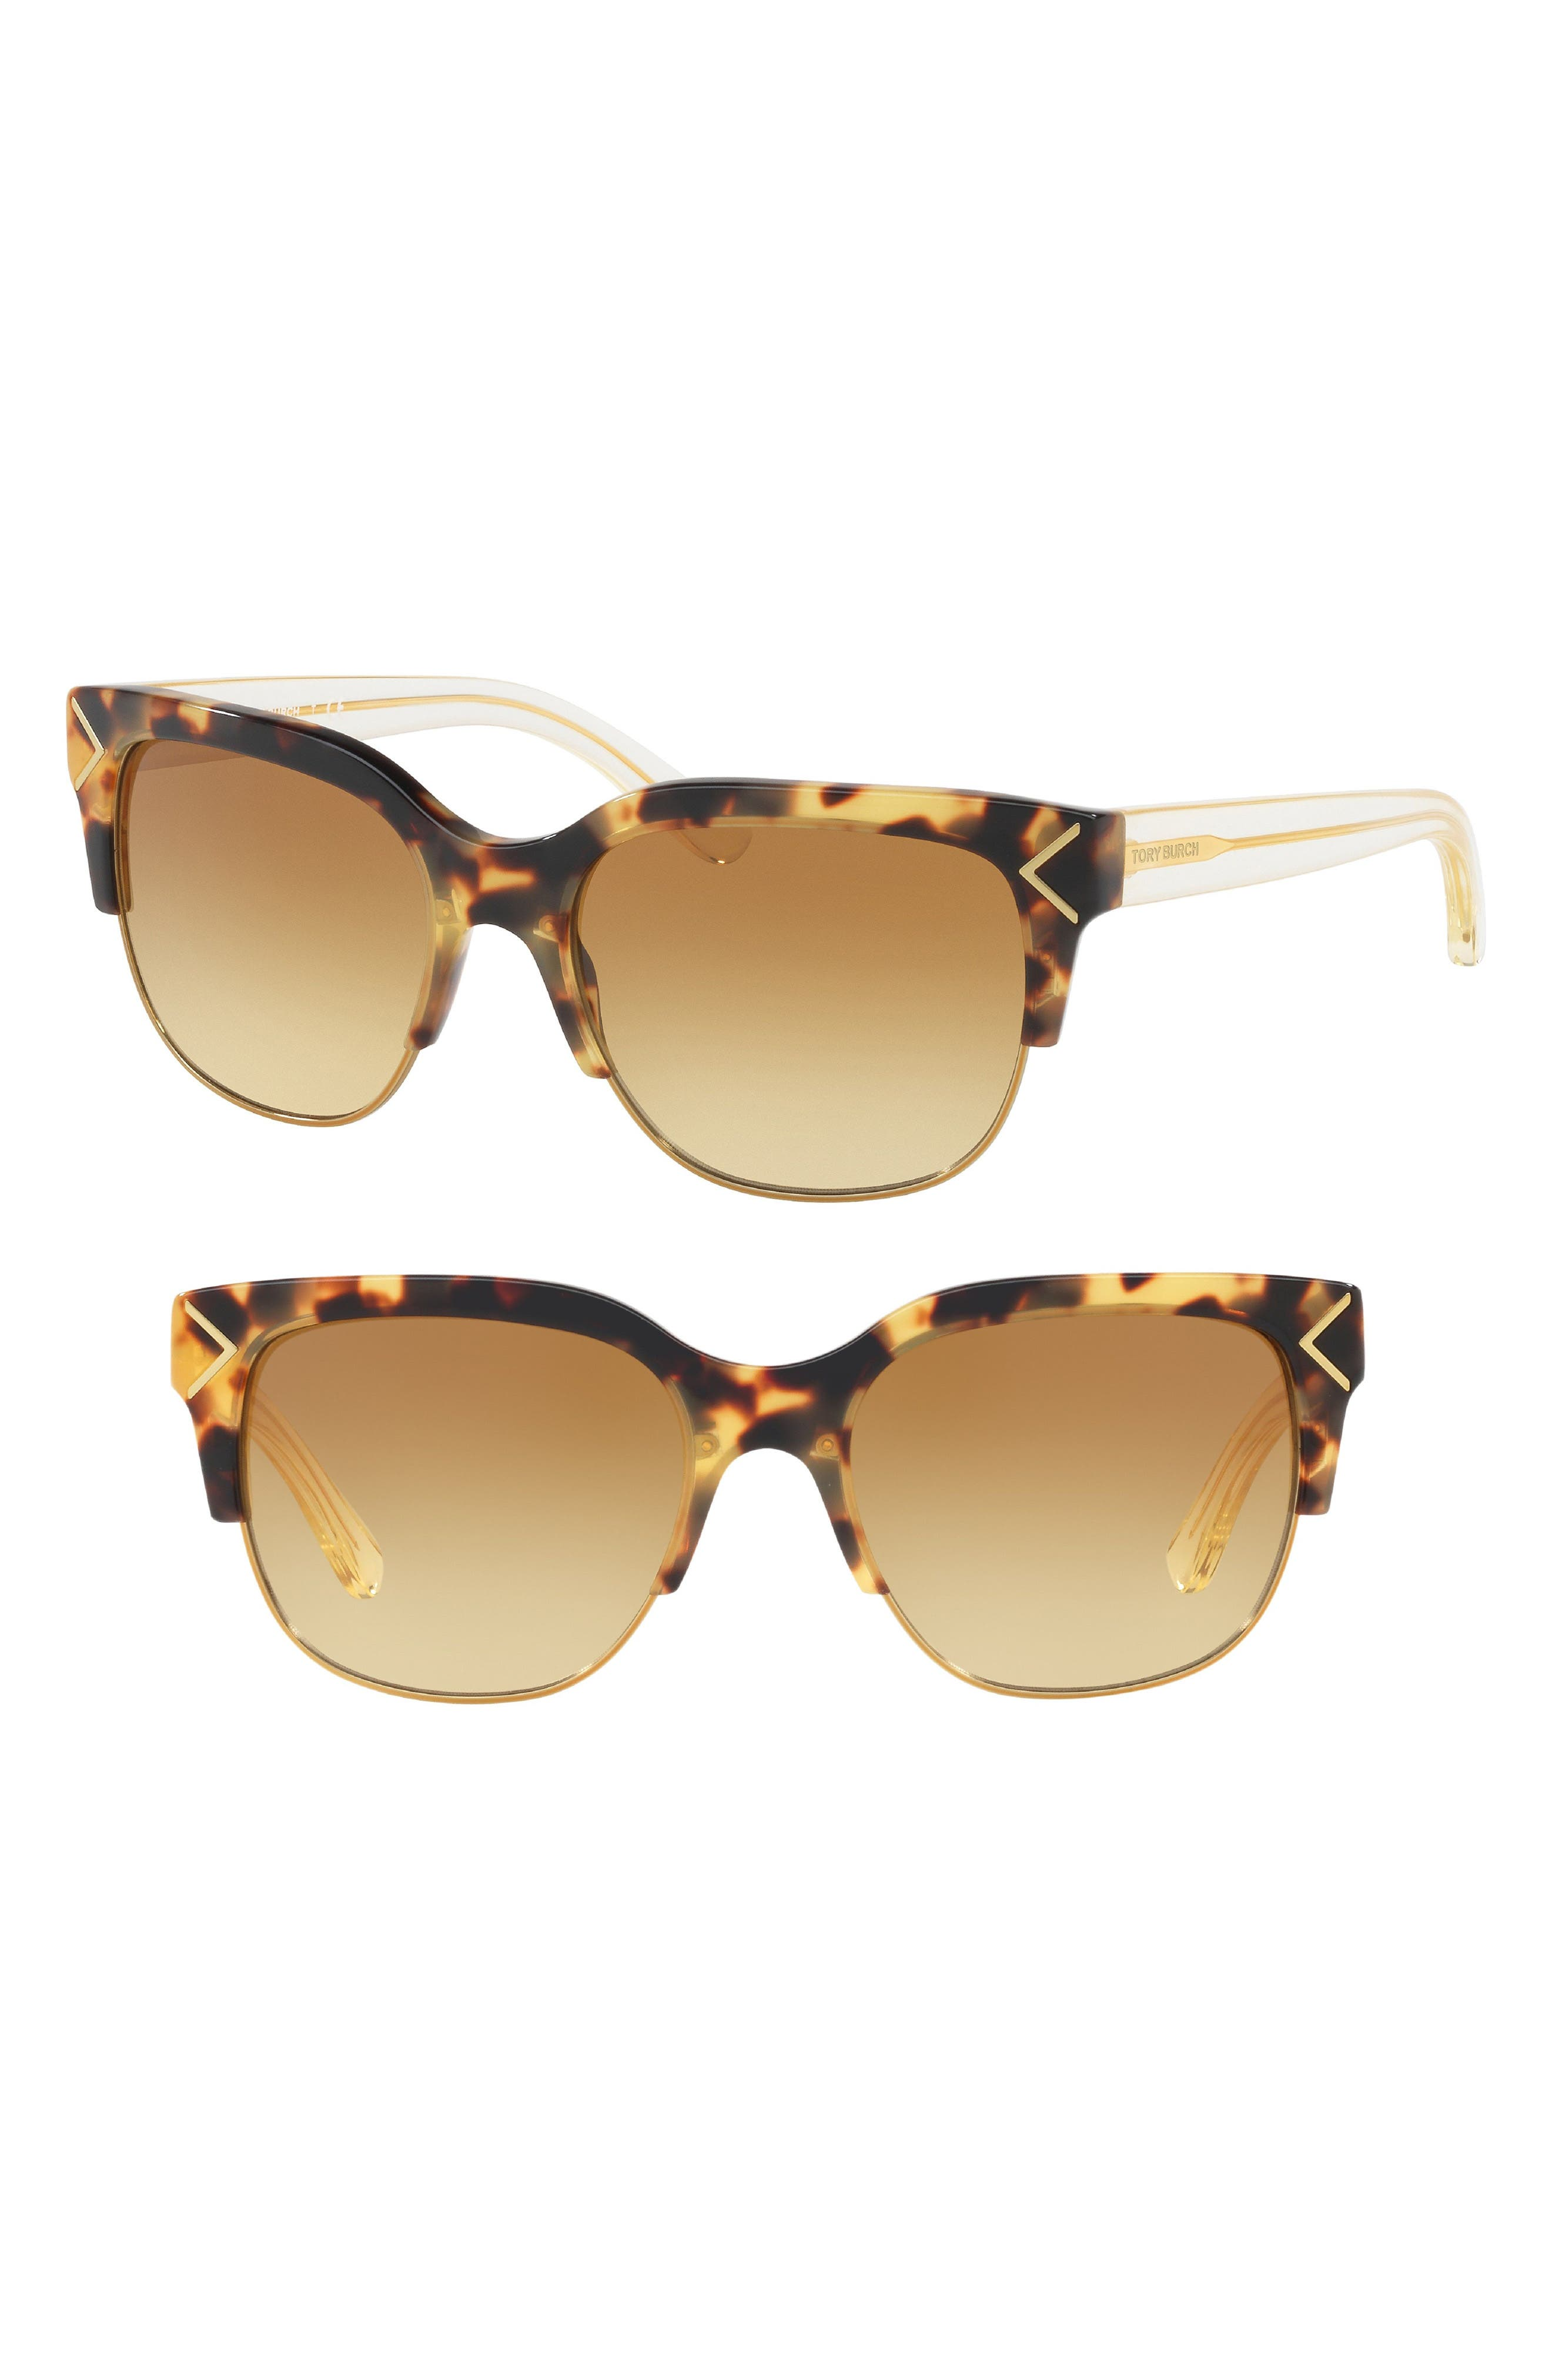 55mm Gradient Square Sunglasses,                         Main,                         color, Gold/ Brown